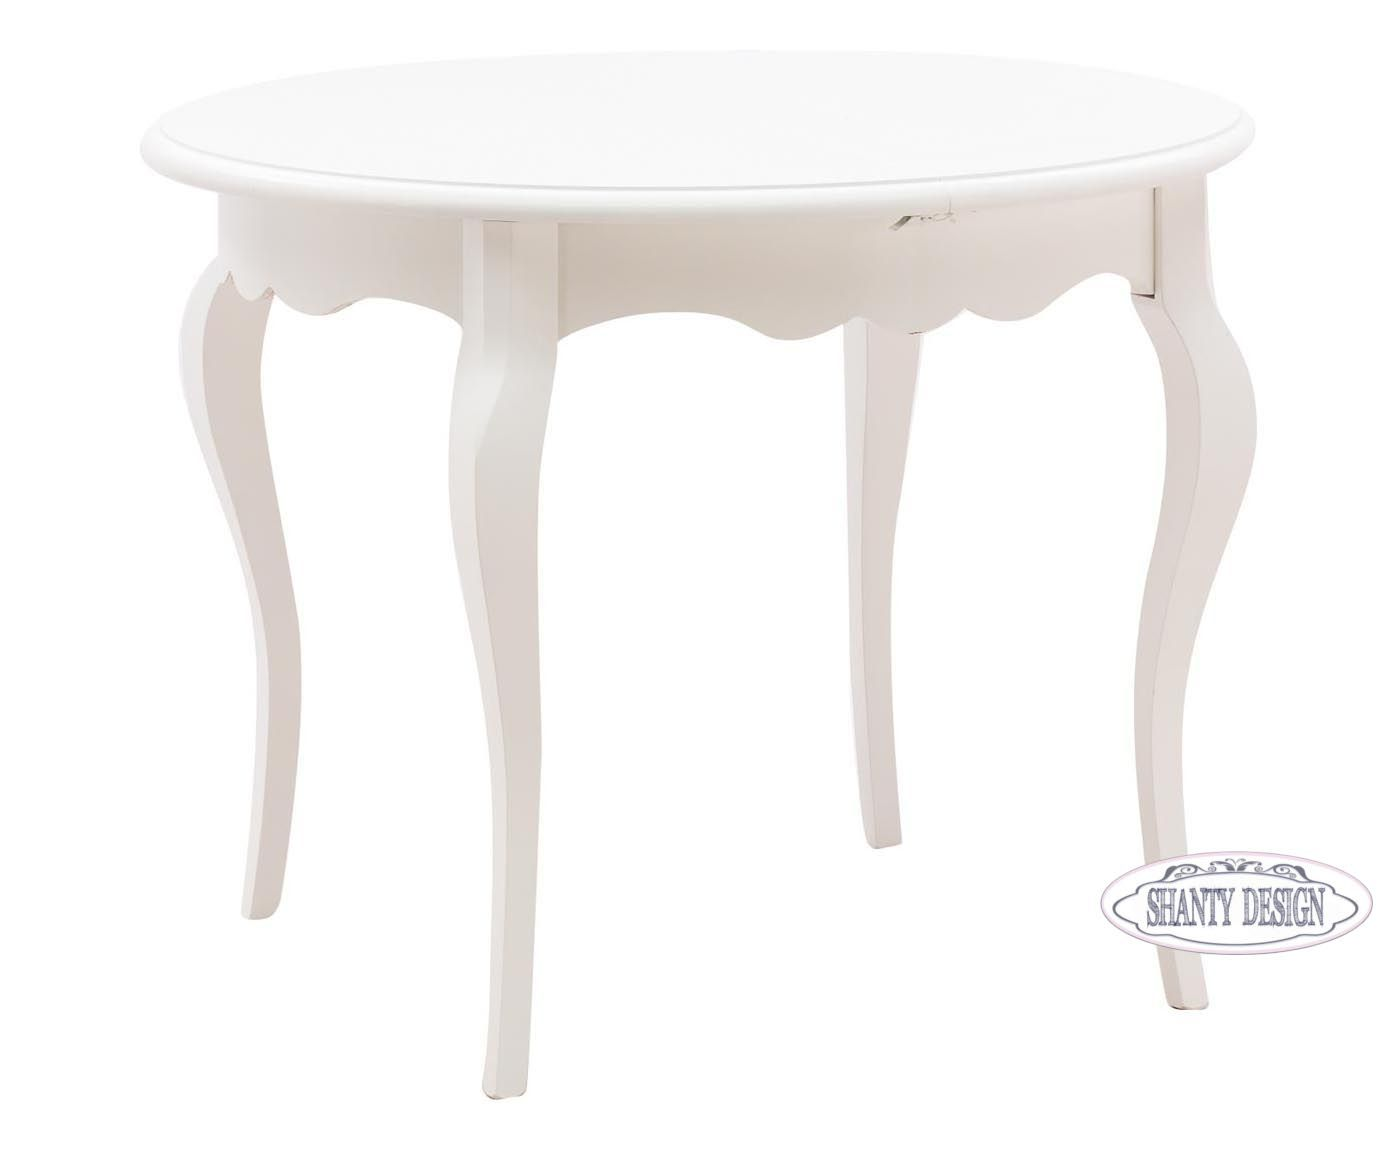 Sedie Shabby Chic Vendita : Tavolo bianco decapato shabby chic mobili provenzali on line